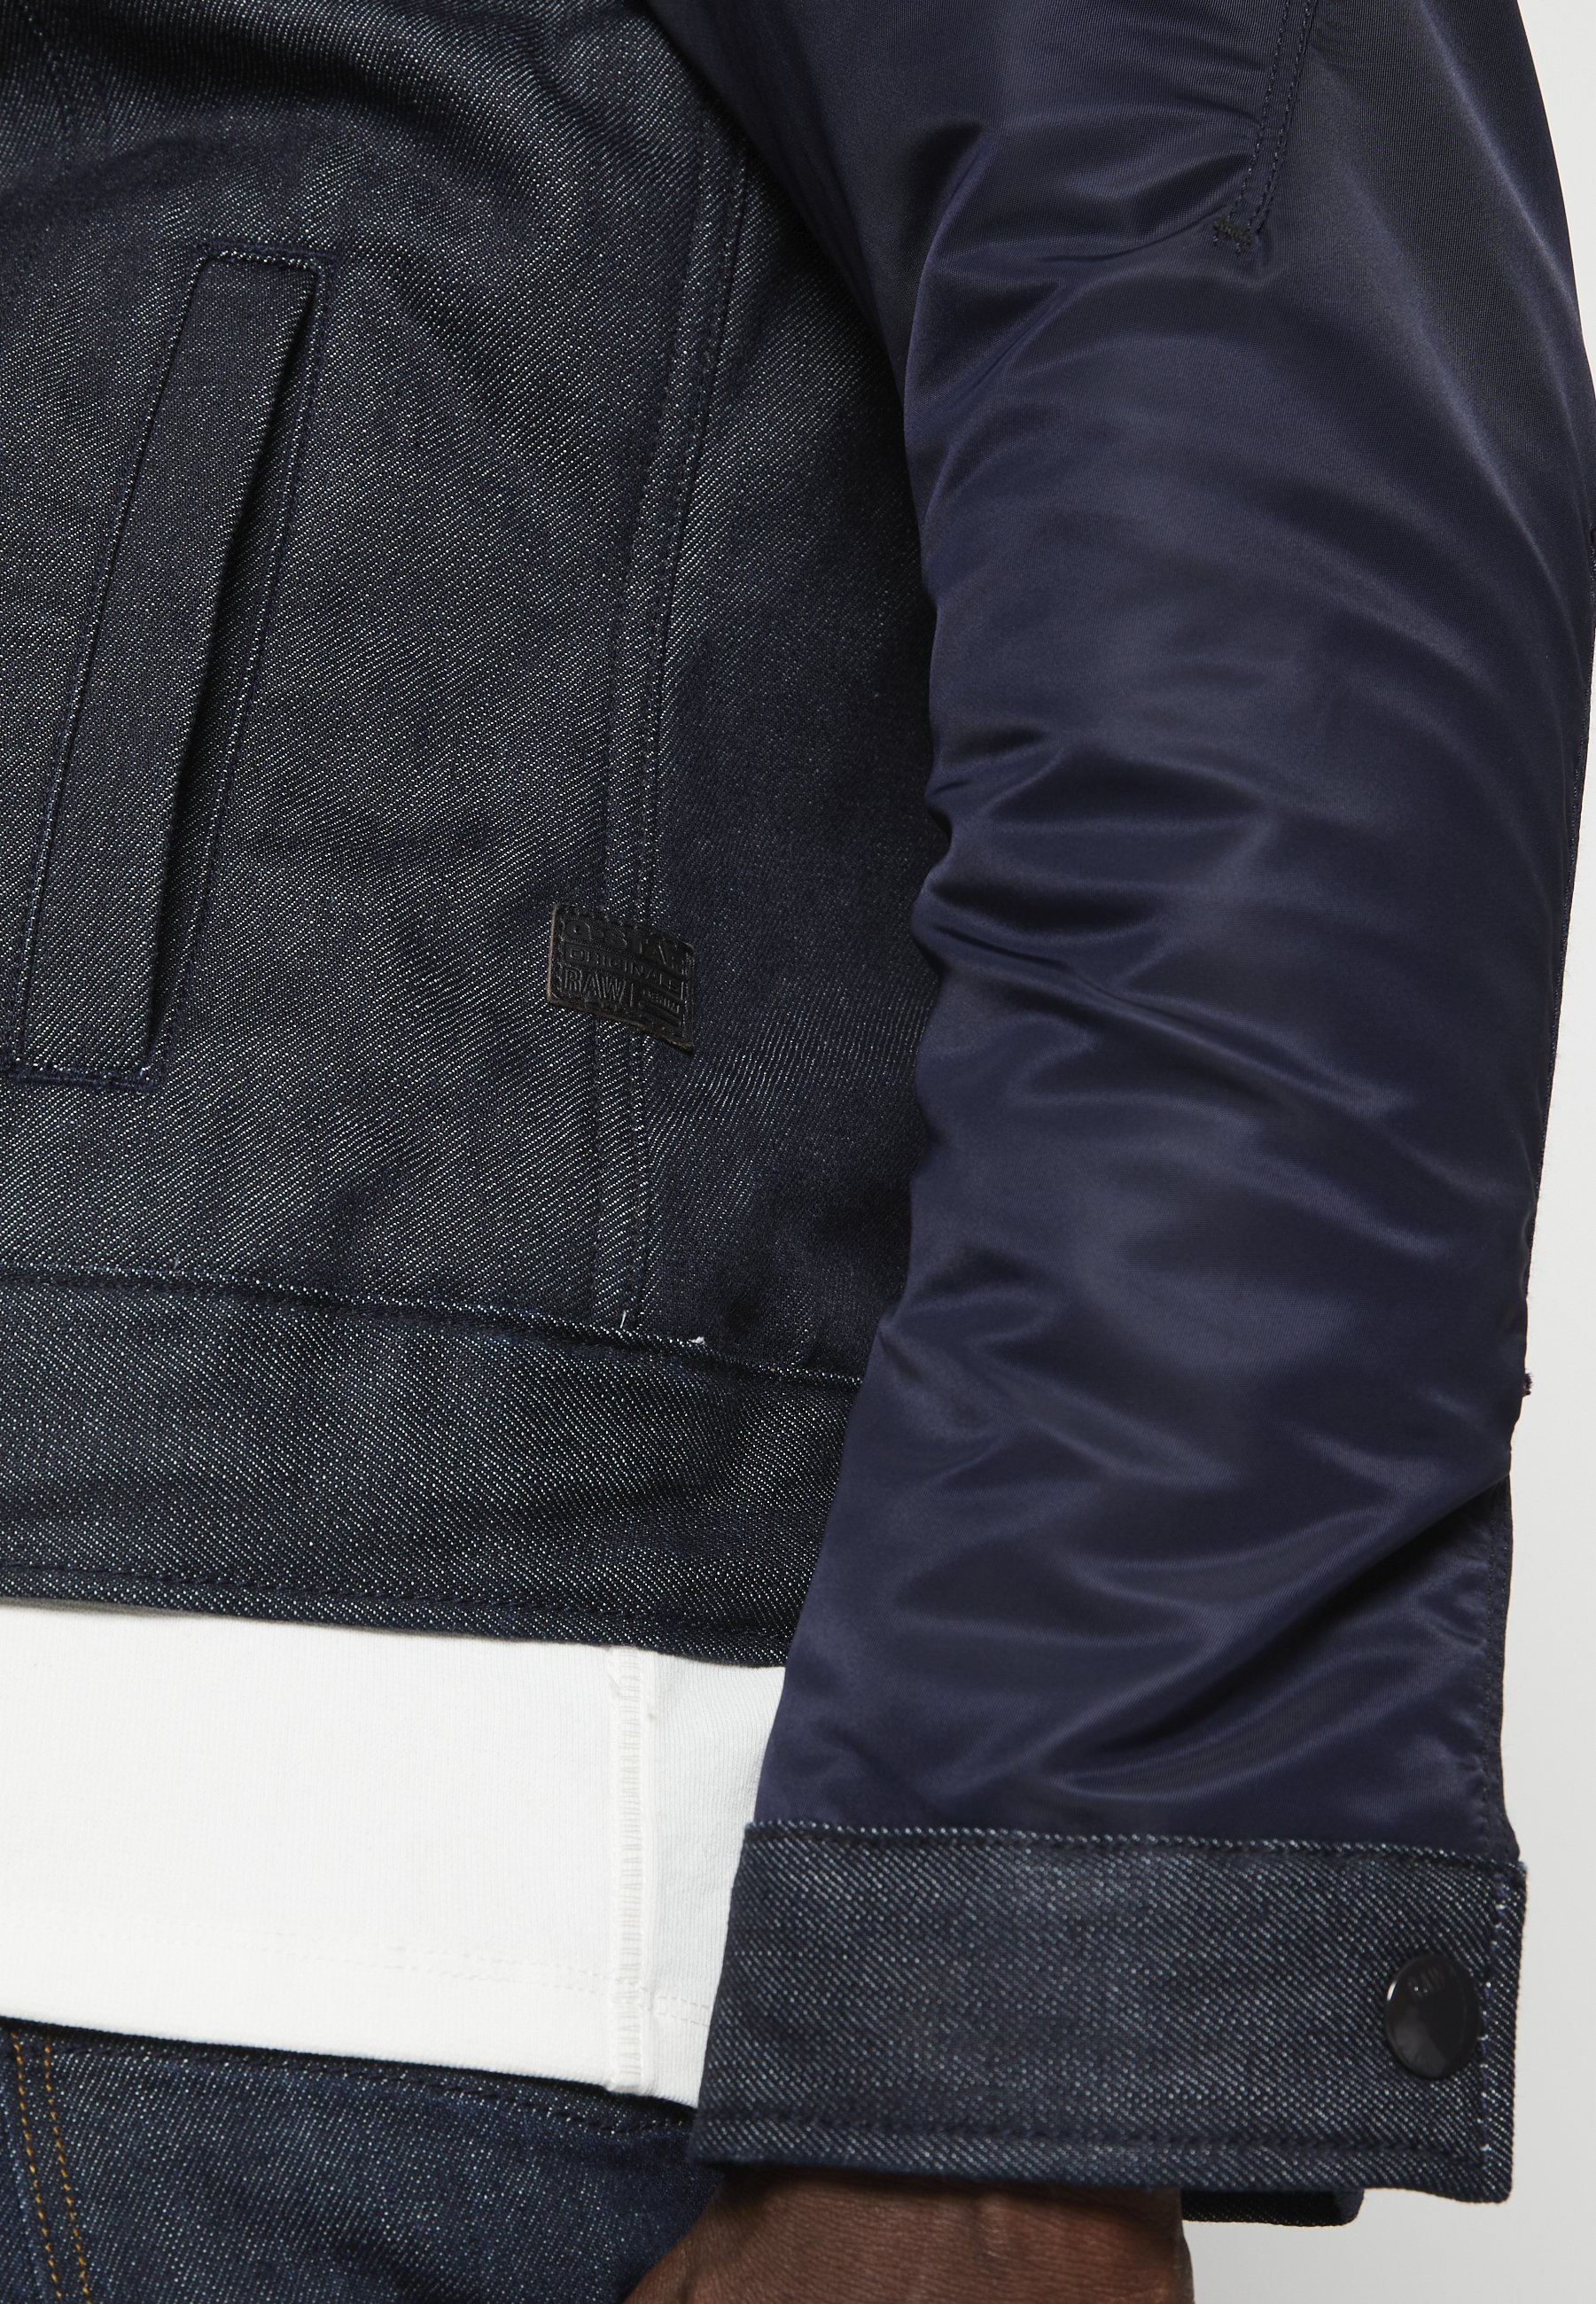 GStar ARC 3D SLIM PADDED Jeansjacke kir denim/raw denim/darkblue denim